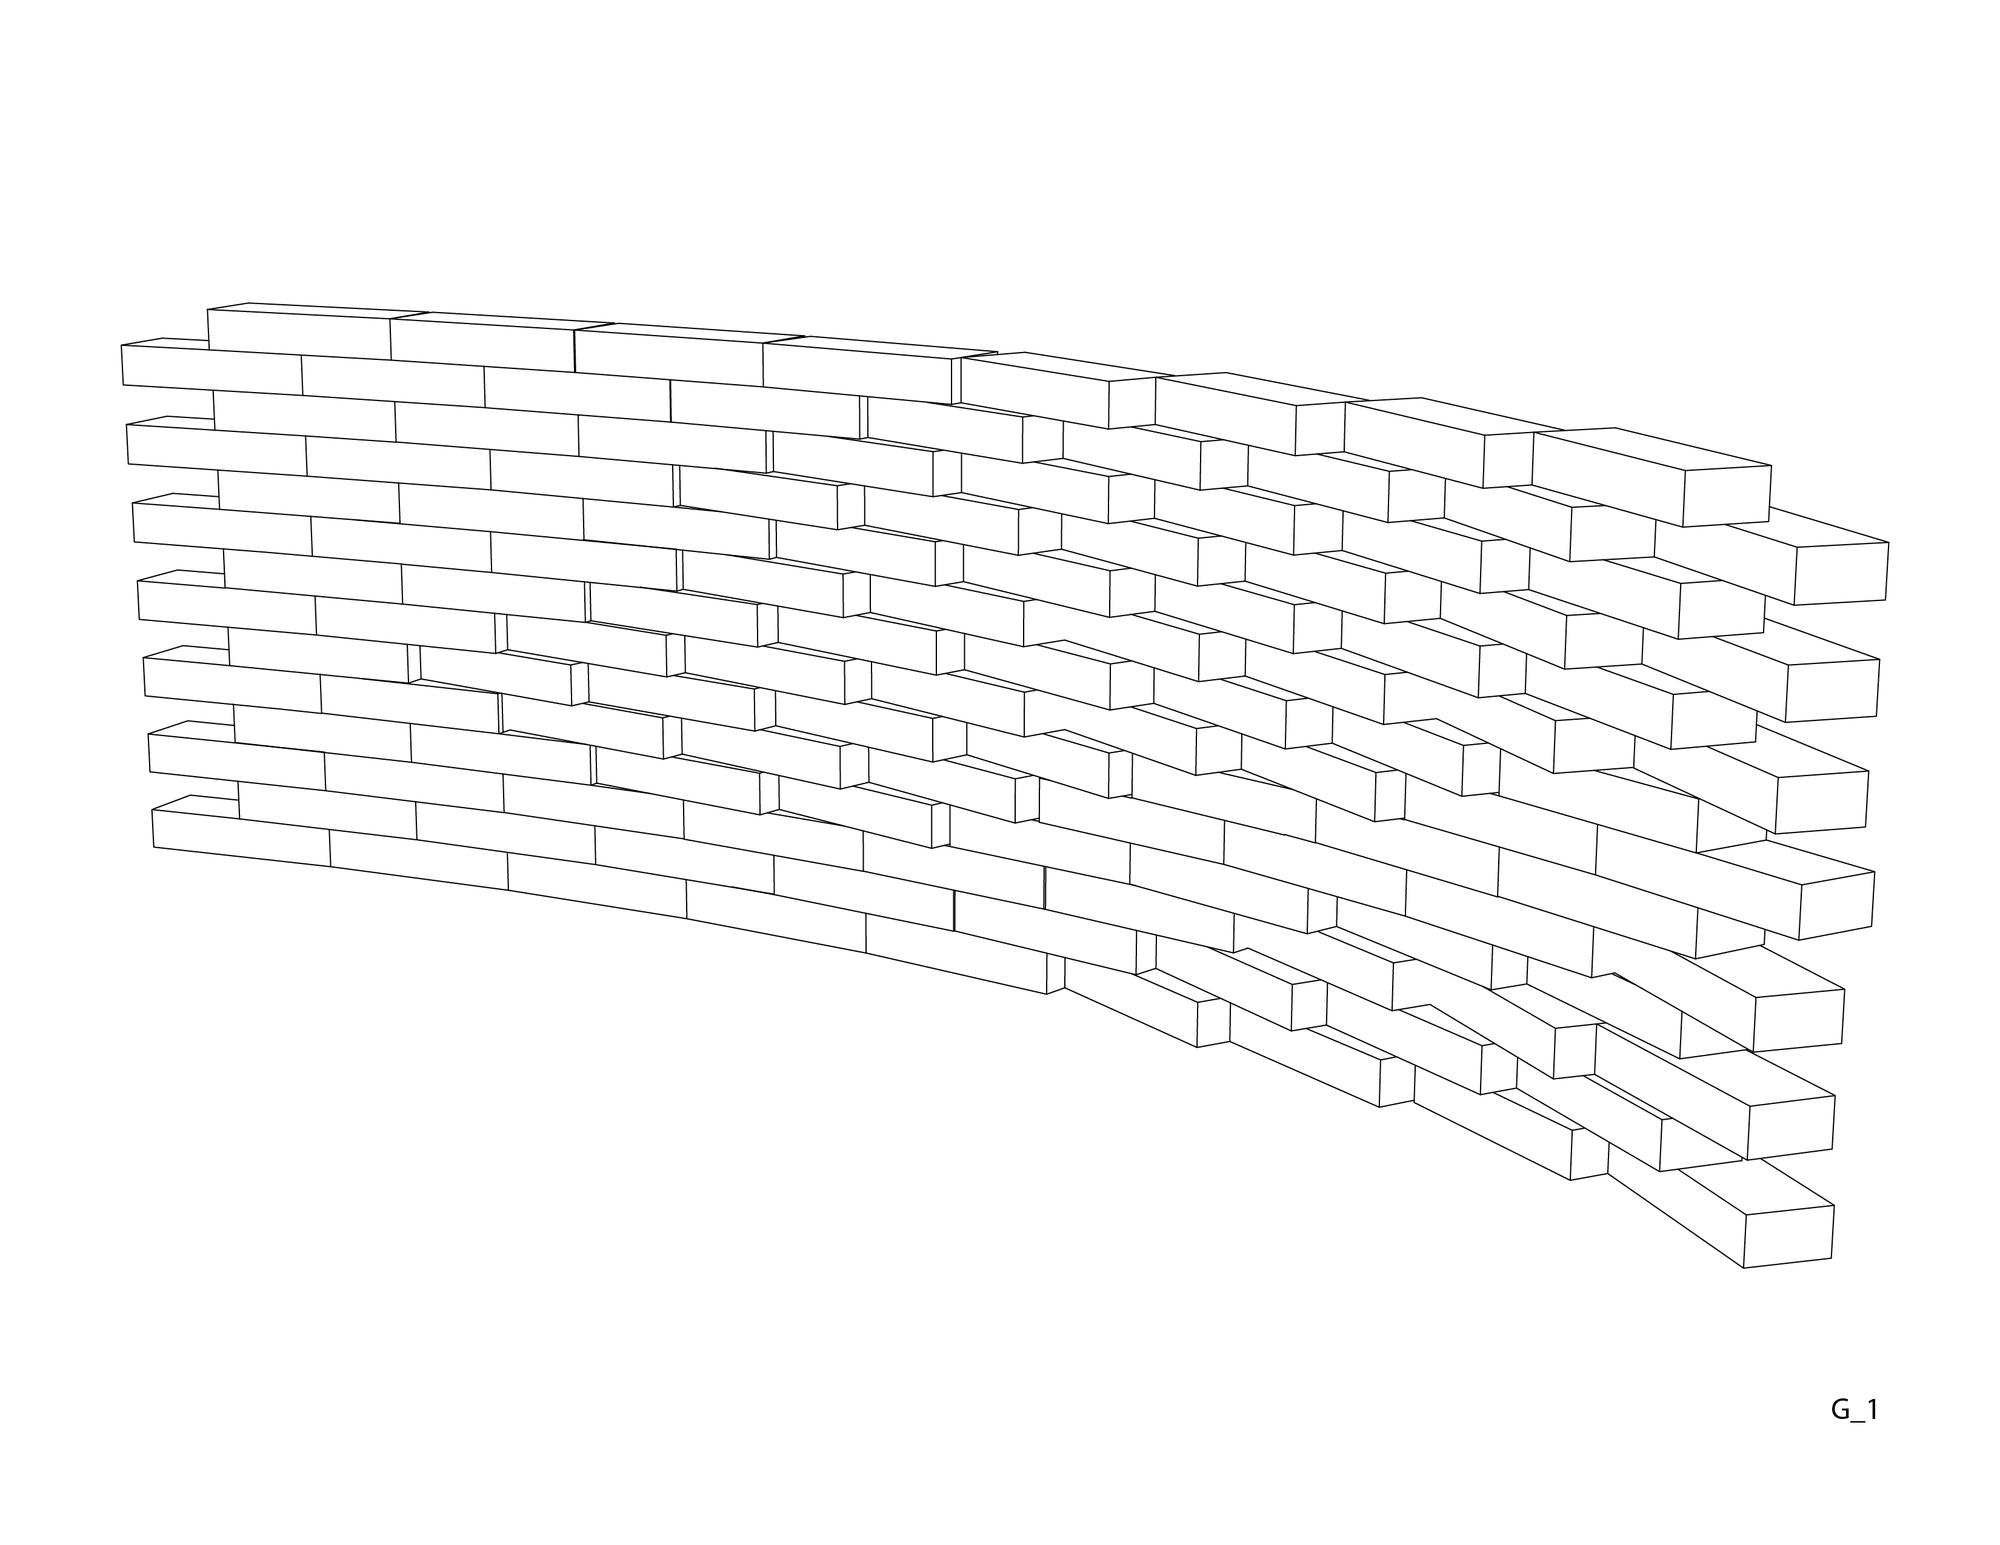 Isométrica: Grupo 1. Image Cortesia de Taller Materialidad 2014 UFSM